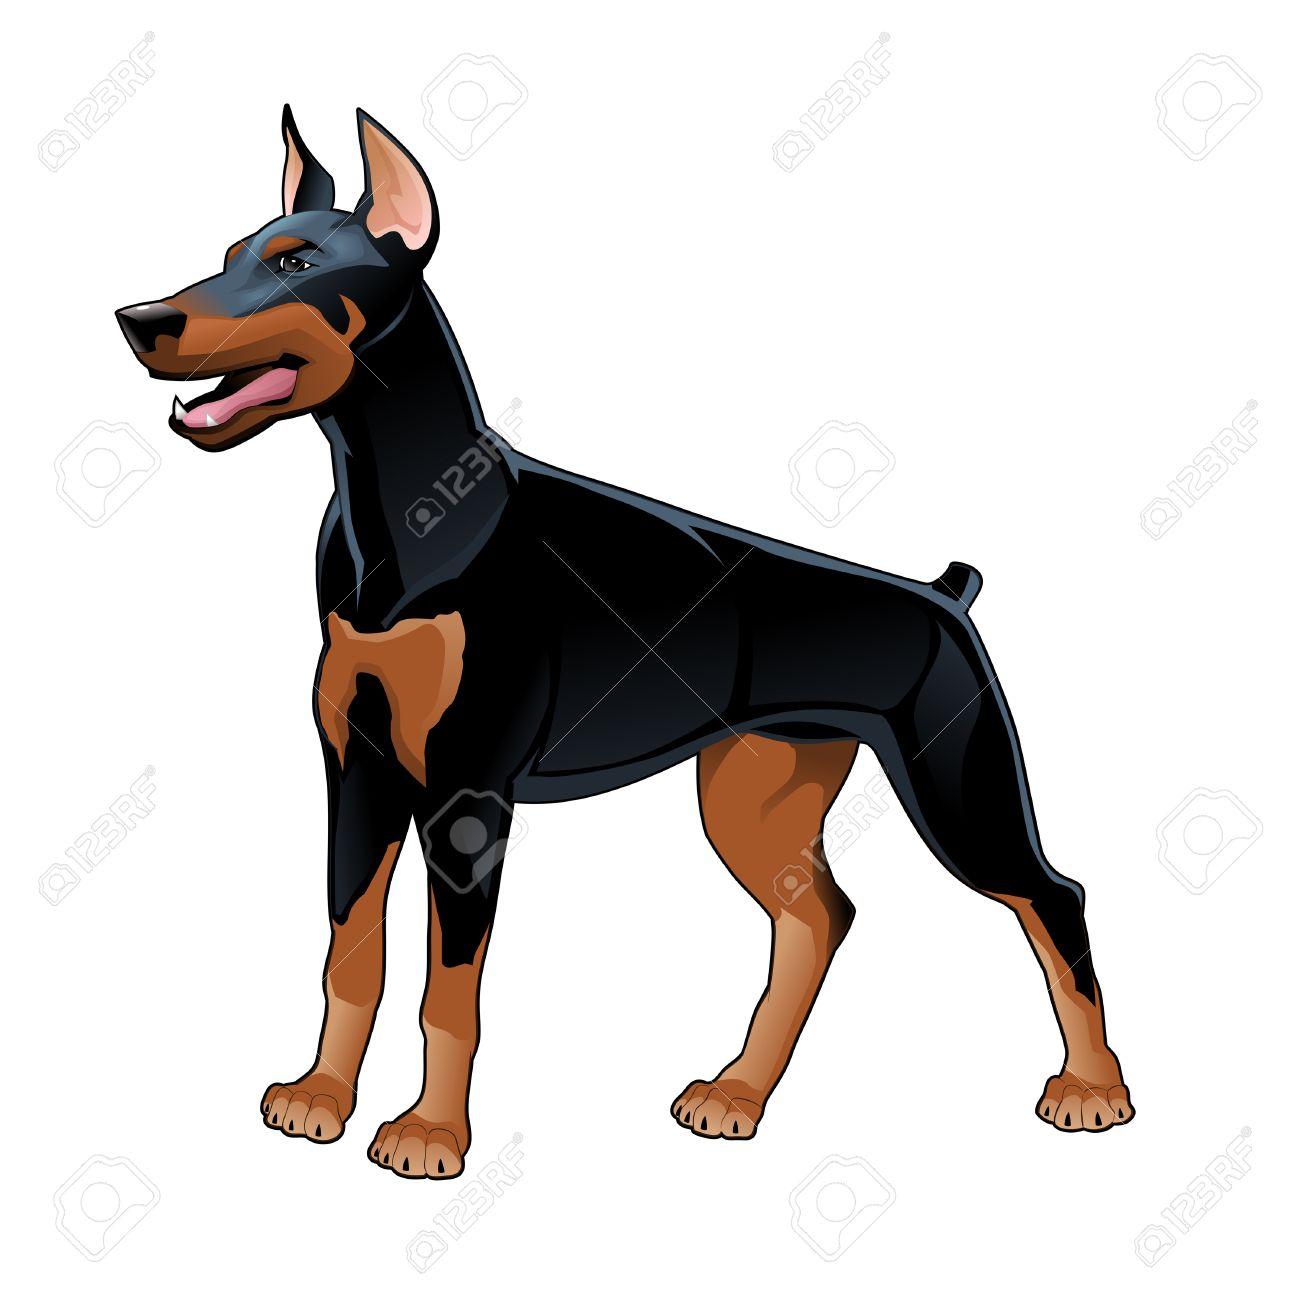 Dobermann Pinscher. Vector isolated dog. Stock Vector - 23237748